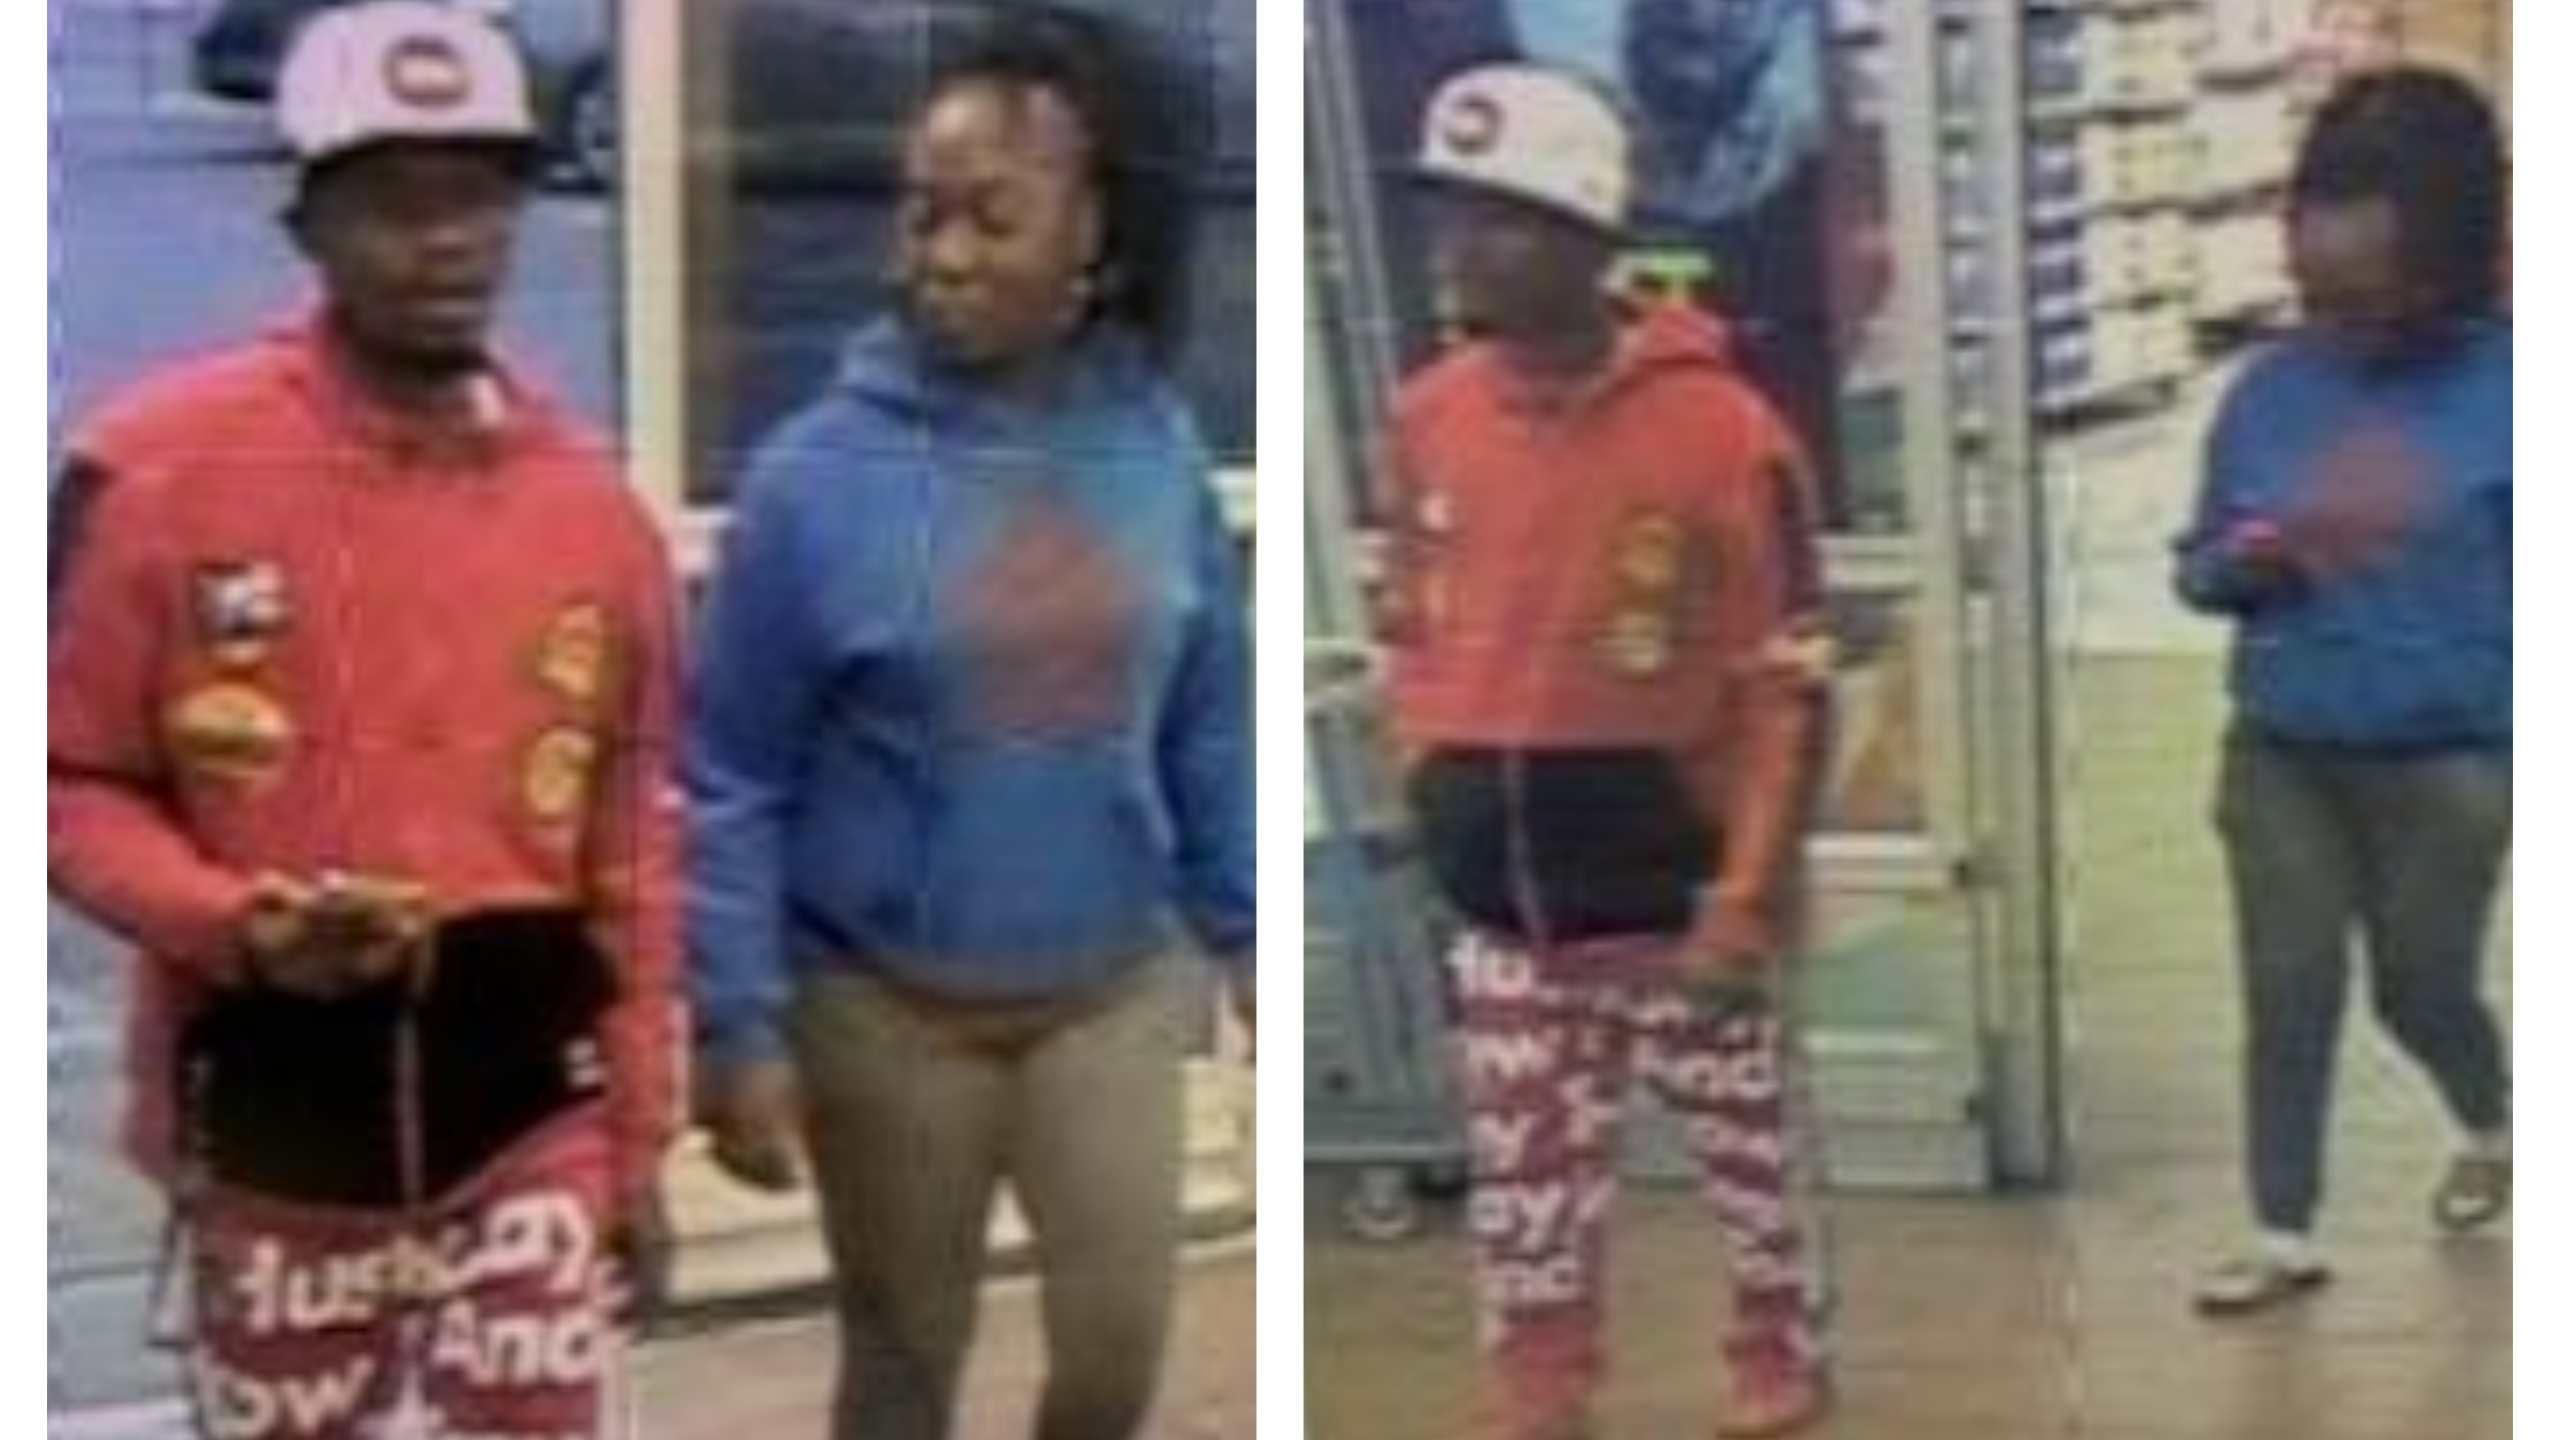 Auto theft suspects 05.13.19_1557768195622.jpg.jpg